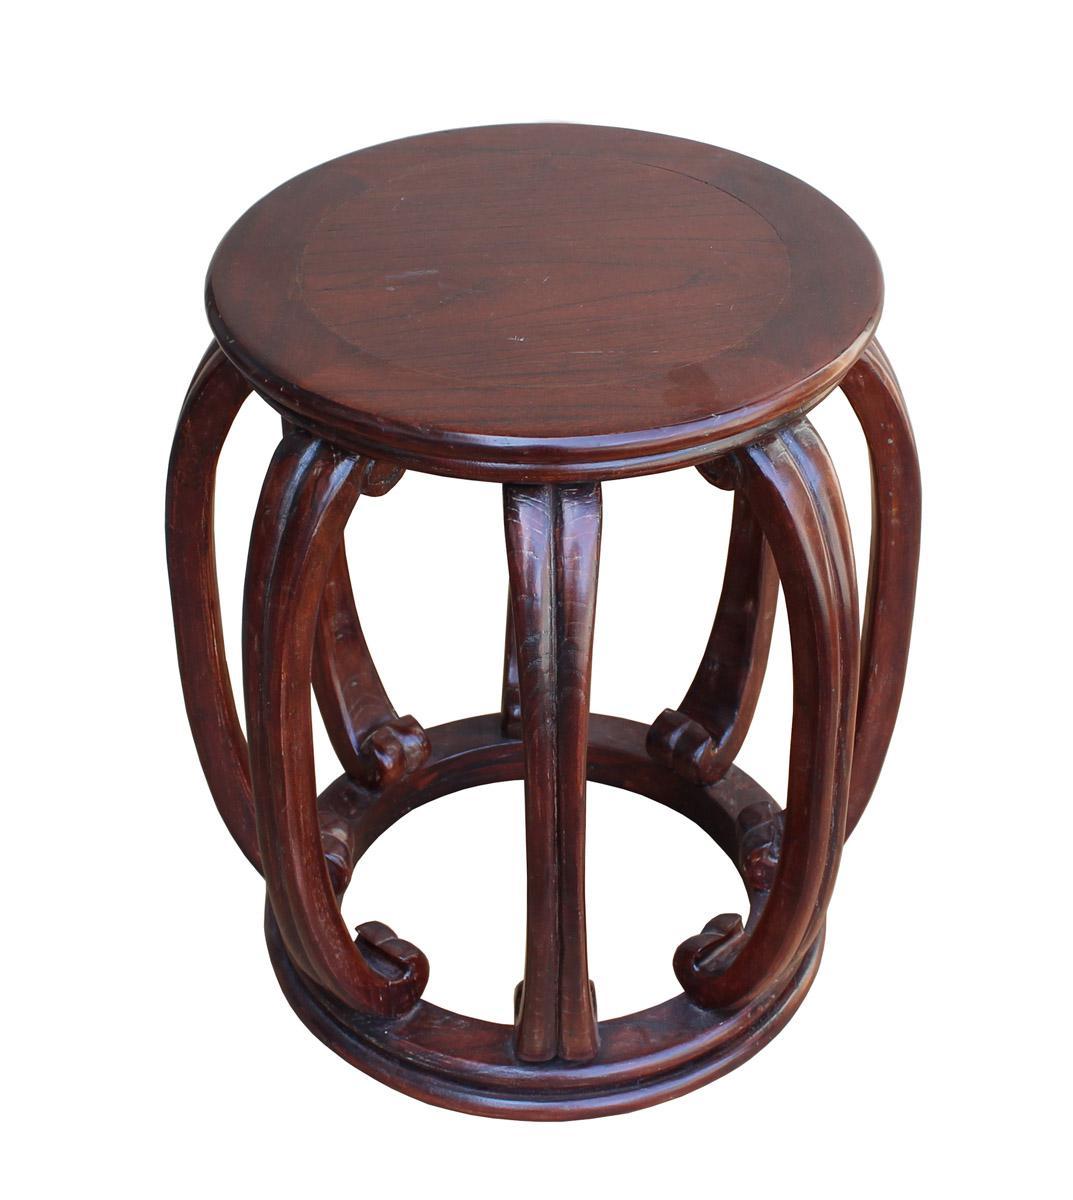 Chinese Oriental Brown Wood Barrel Stool - Image 3 of 6  sc 1 st  Chairish & Chinese Oriental Brown Wood Barrel Stool | Chairish islam-shia.org